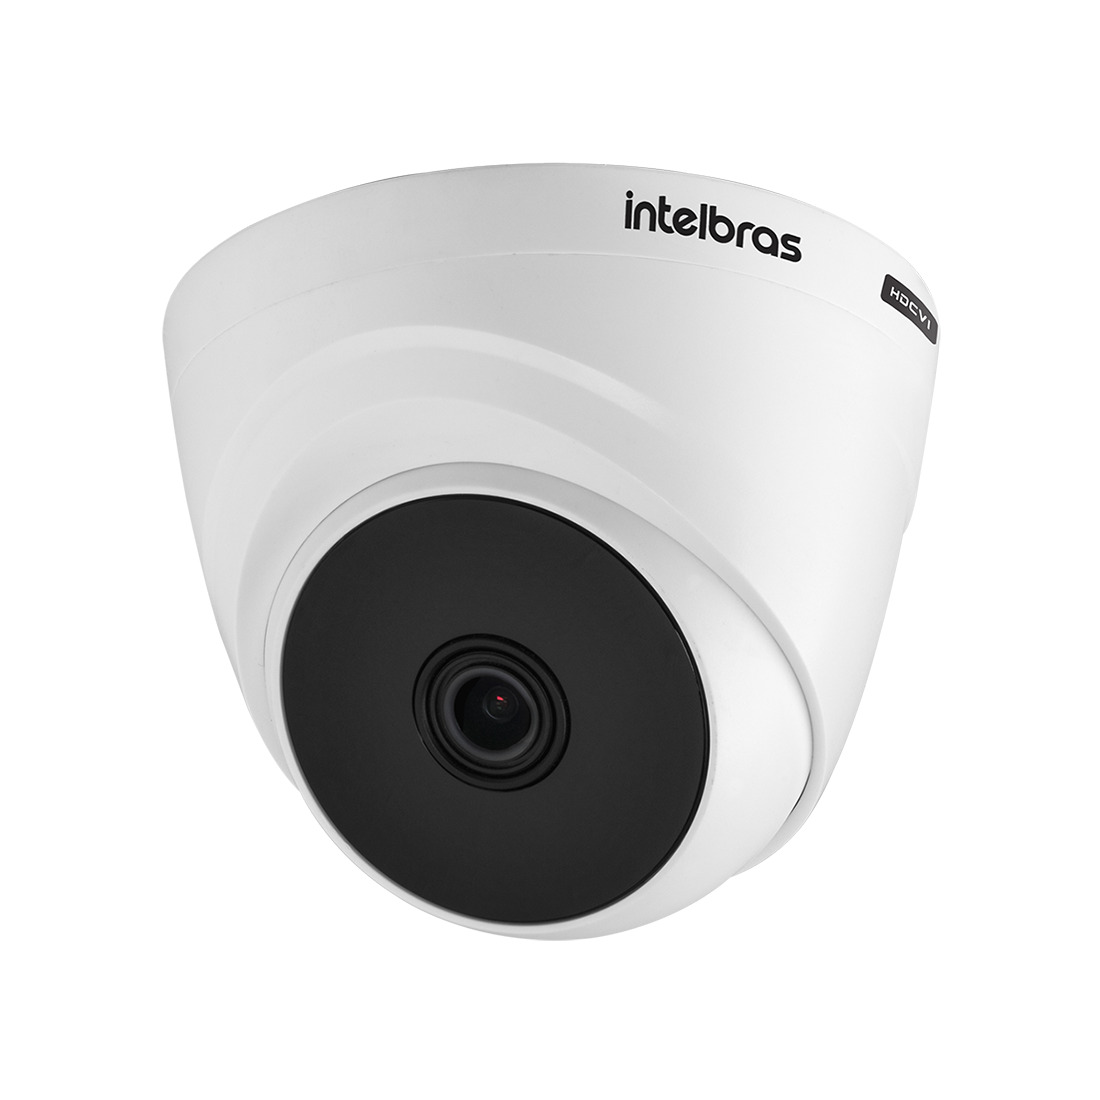 Kit 2 Câmeras Intelbras VHL 1120 D + 2 Fontes 12V Intelbras